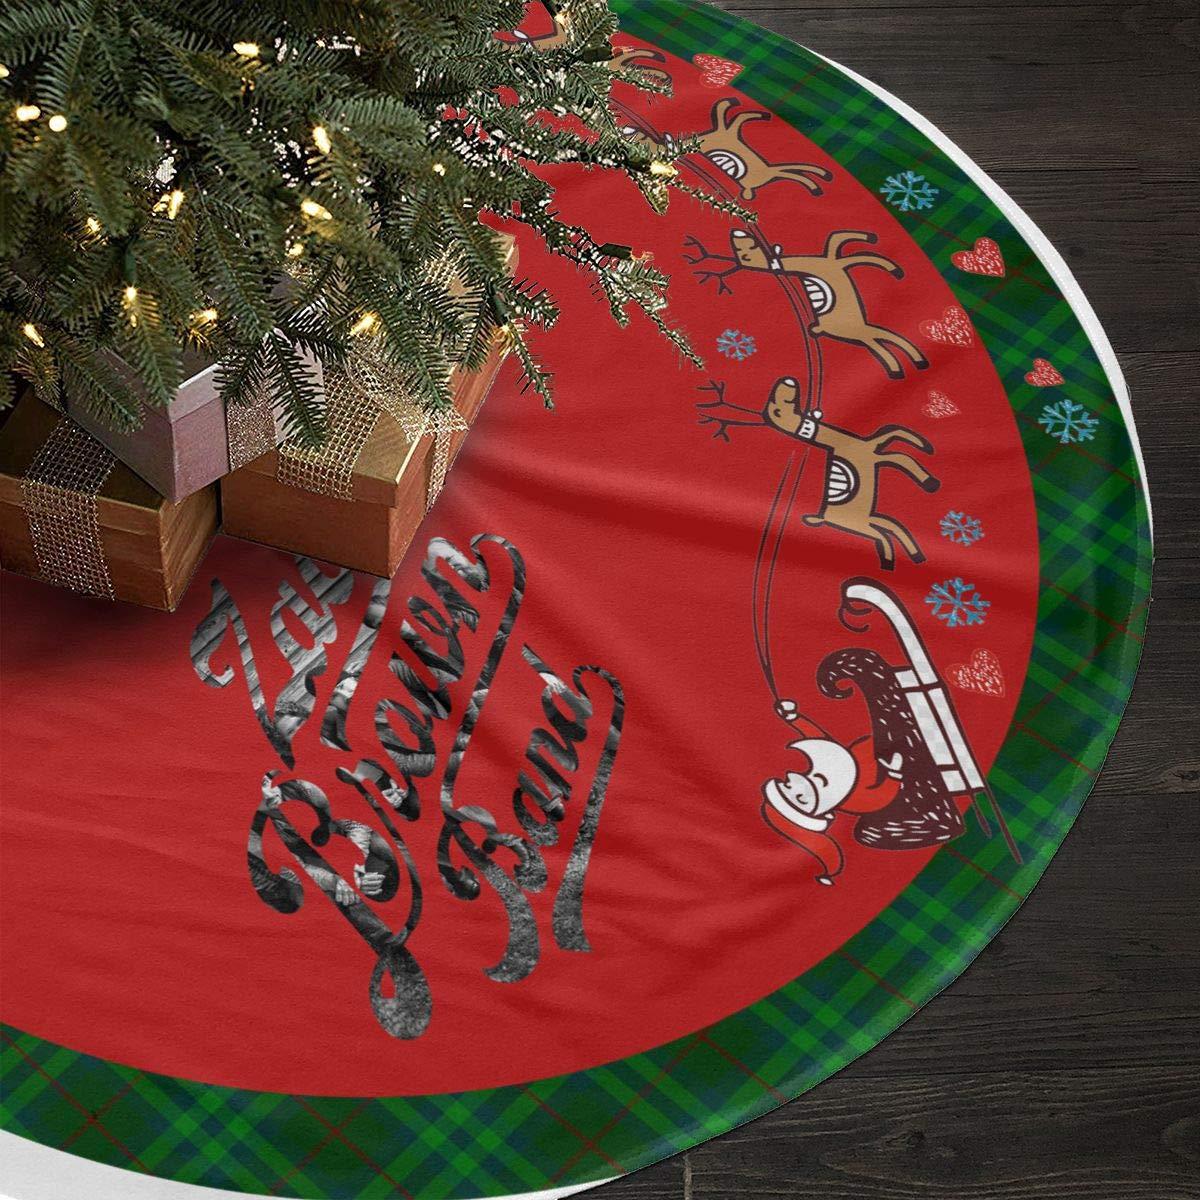 Amazon.com: DeclanI Zac Brown Band Christmas Tree Skirt - Xmas Tree ...